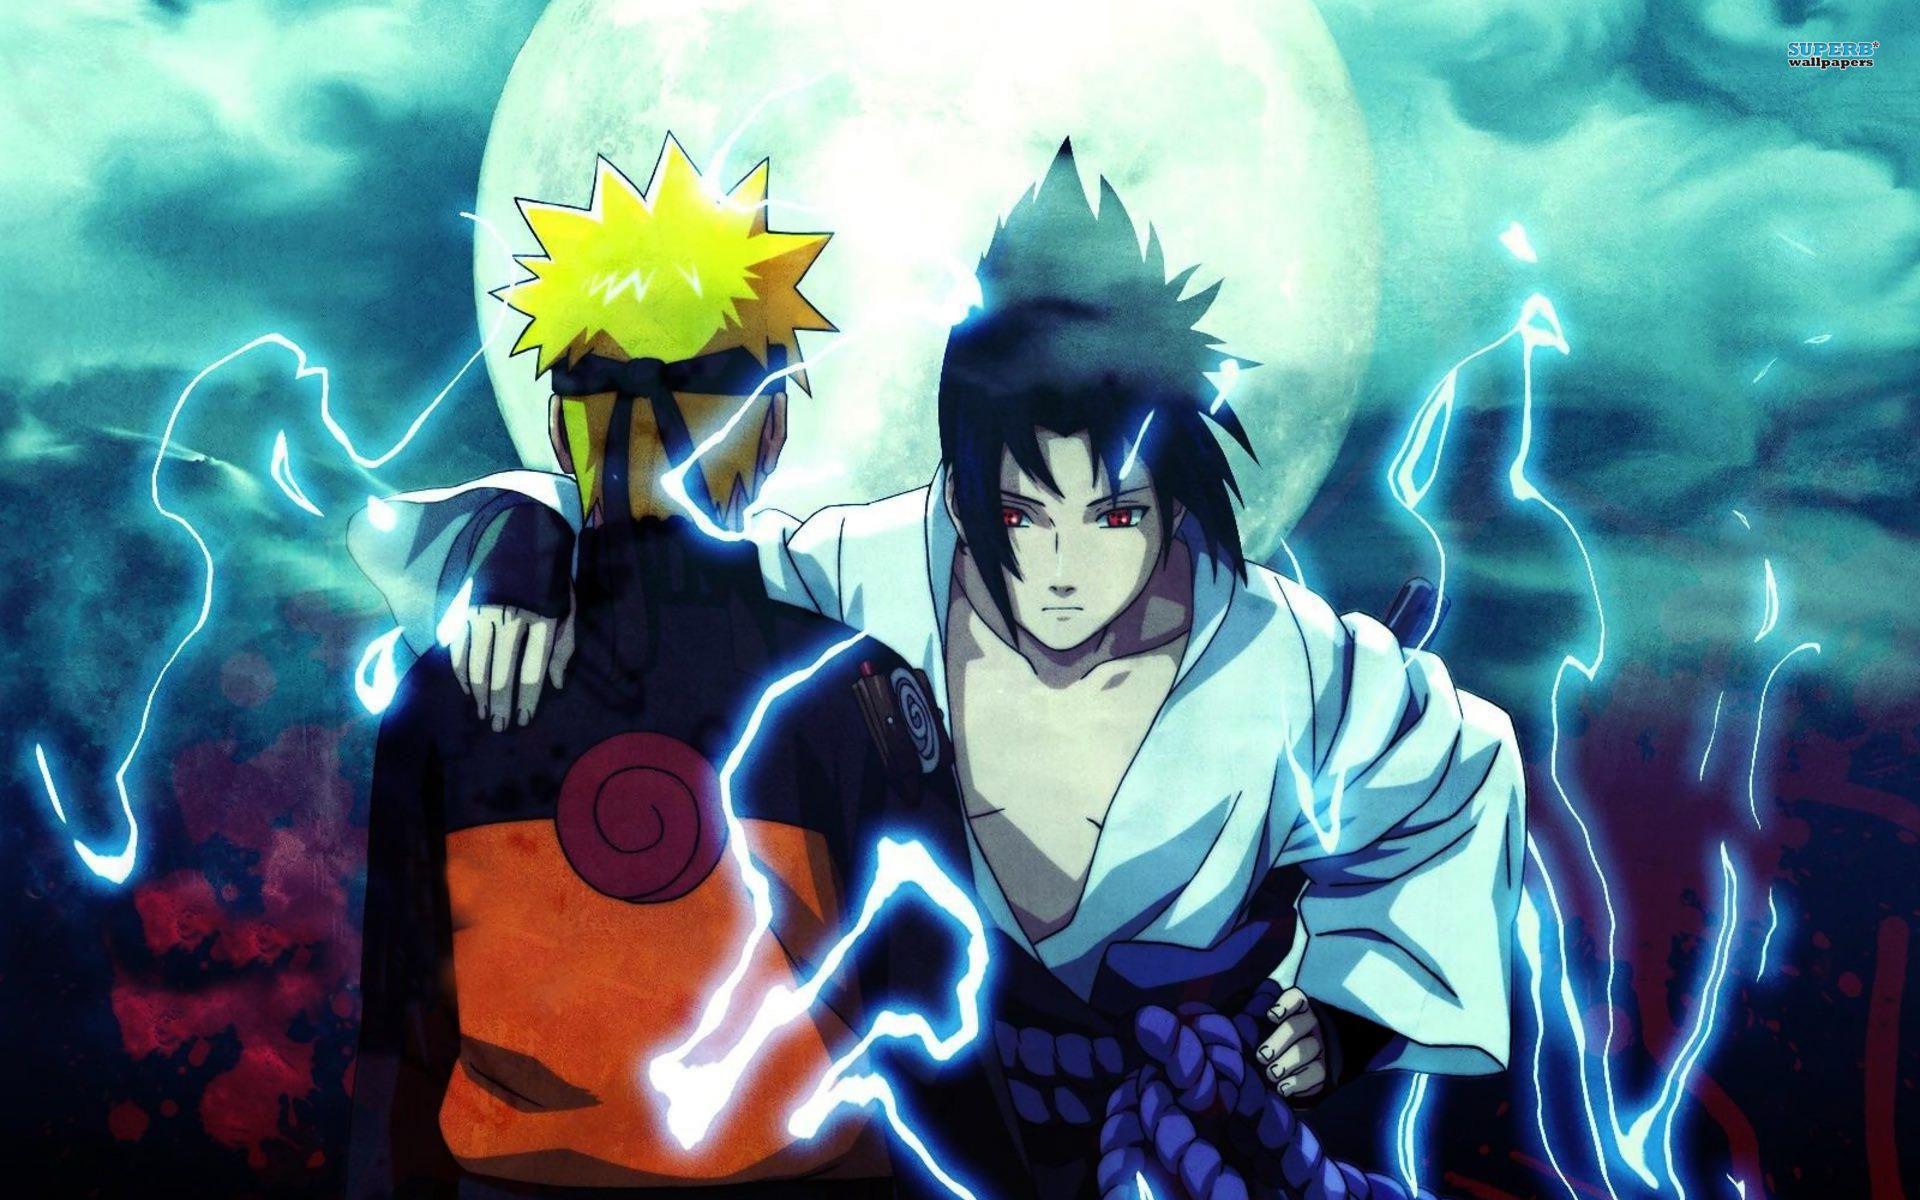 Pin By Alice On A Story Anime Wallpaper Android Wallpaper Anime Naruto And Sasuke